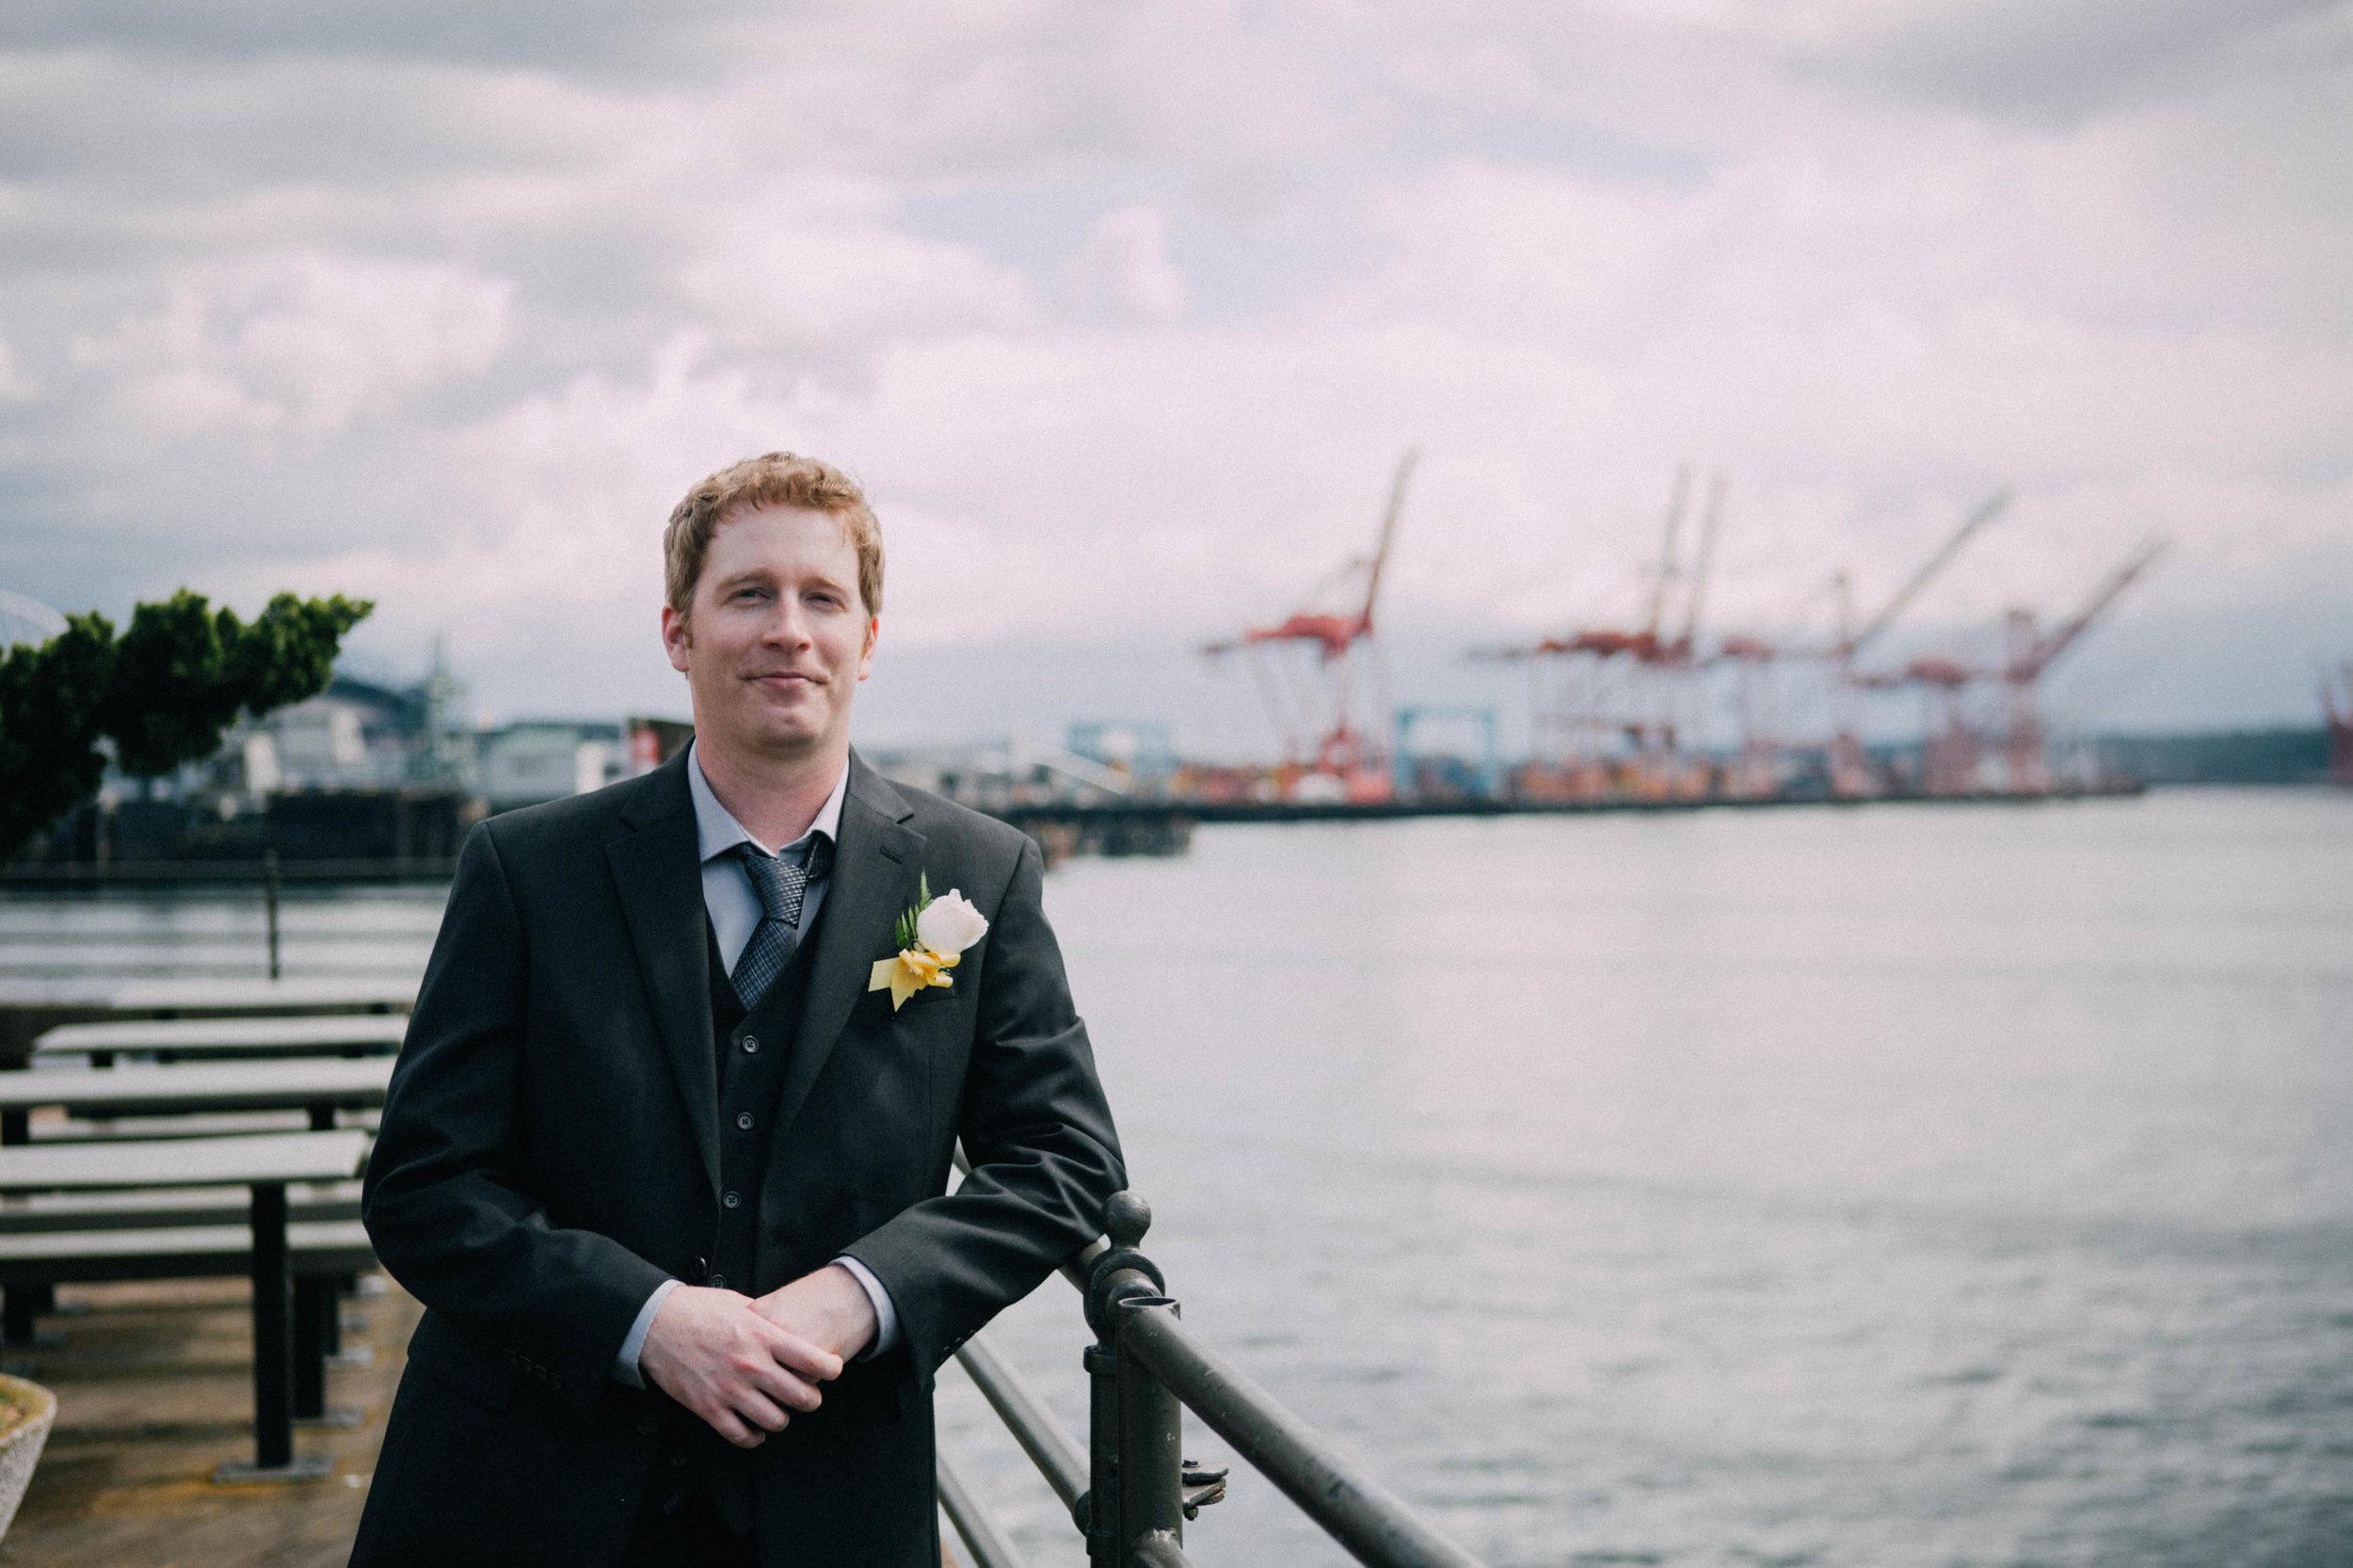 Seattle Courthouse Wedding Photographer-2.jpg